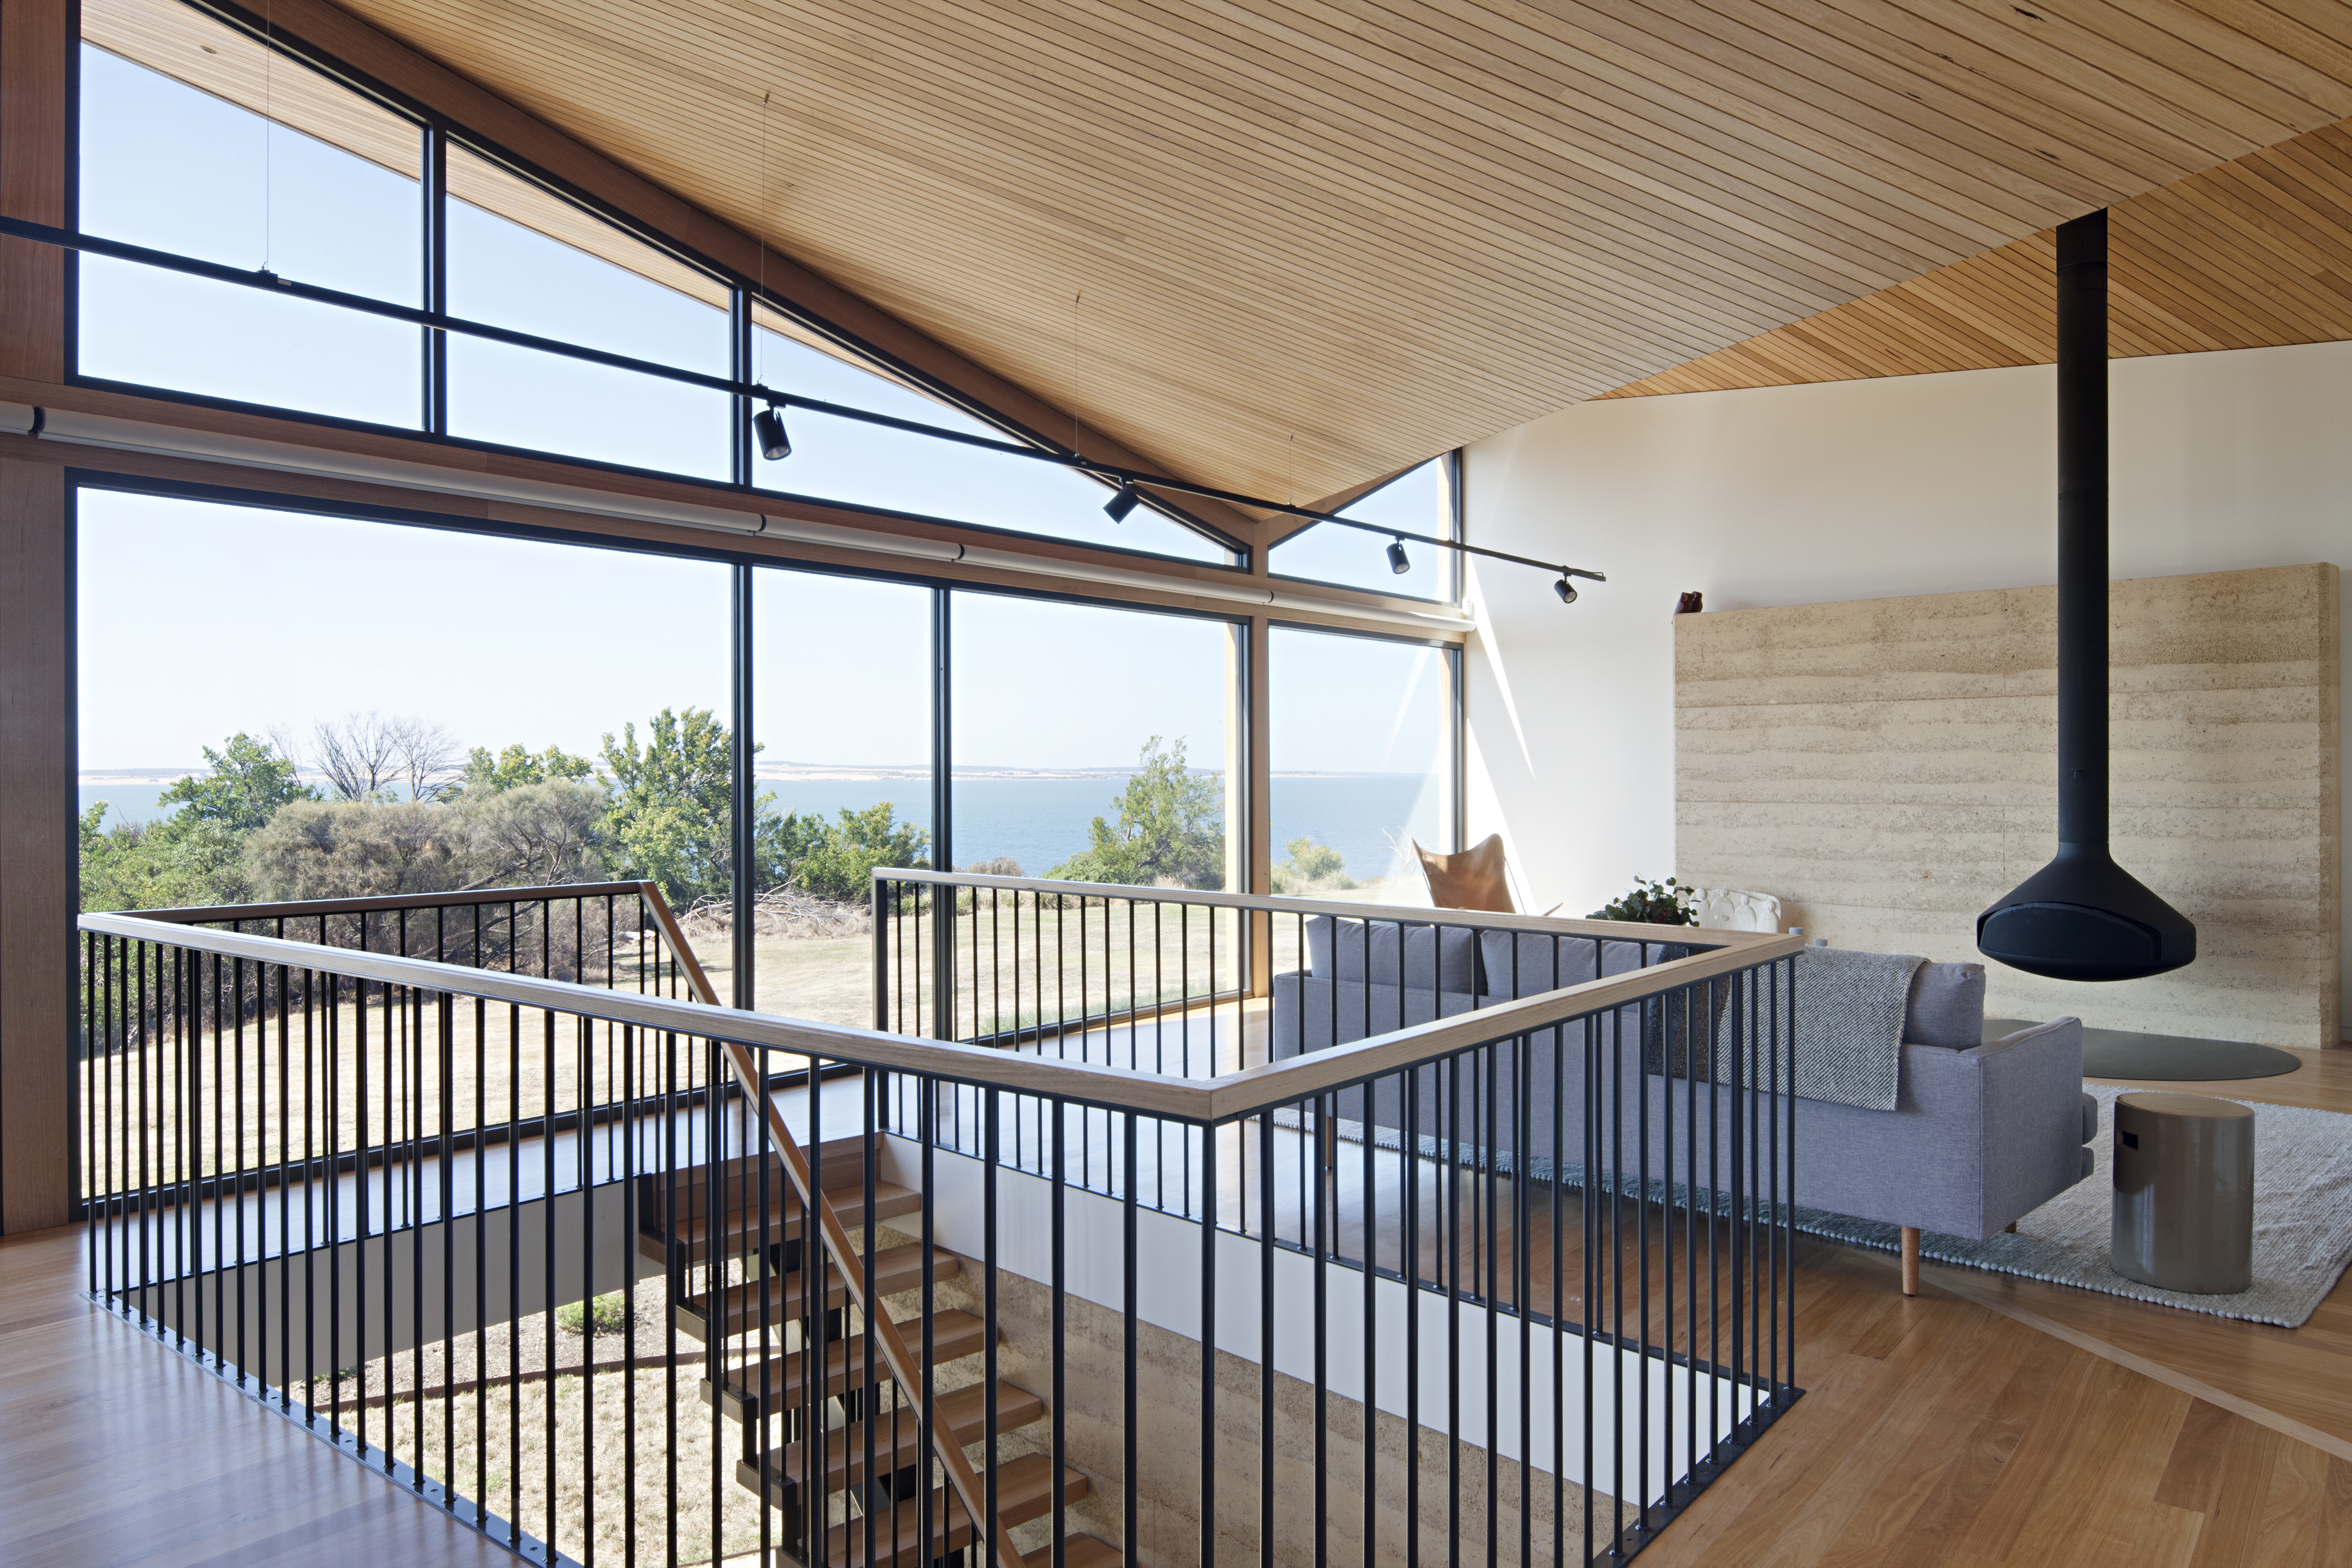 House design awards 2017 - House Design Awards 2017 31